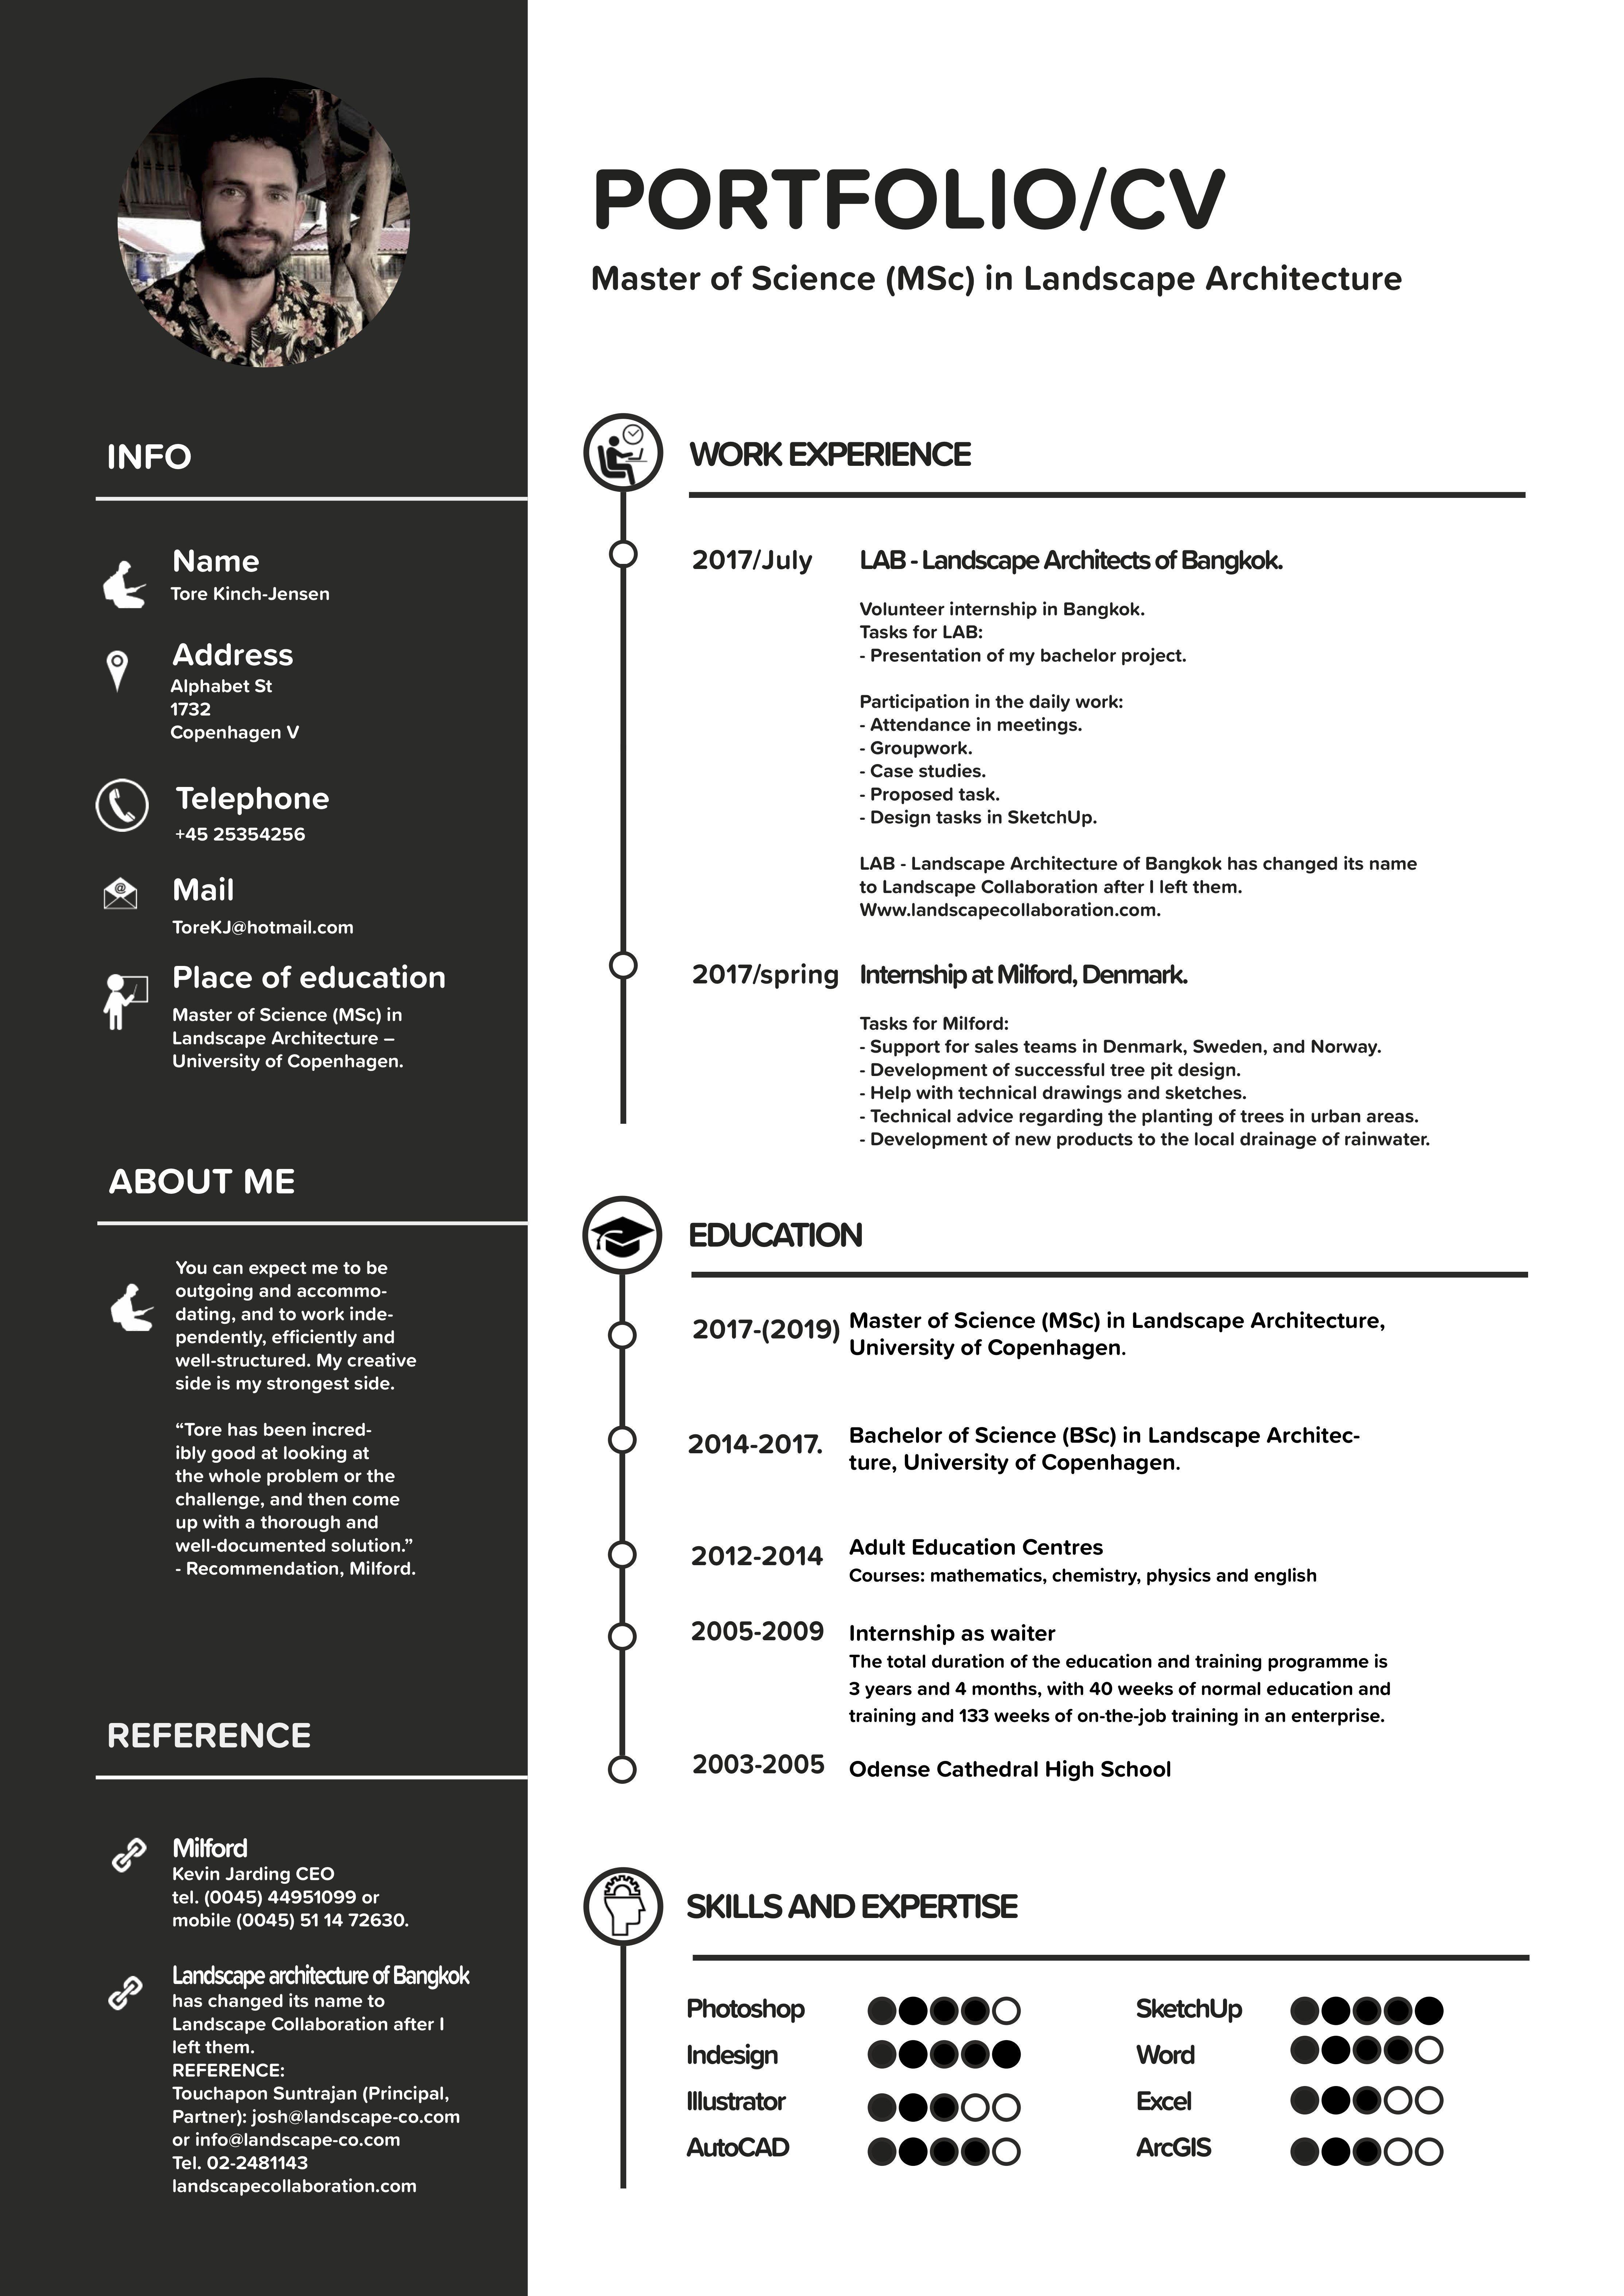 Resumelandscape Portfolio D Architecture Modele Cv Design Cv Creatif